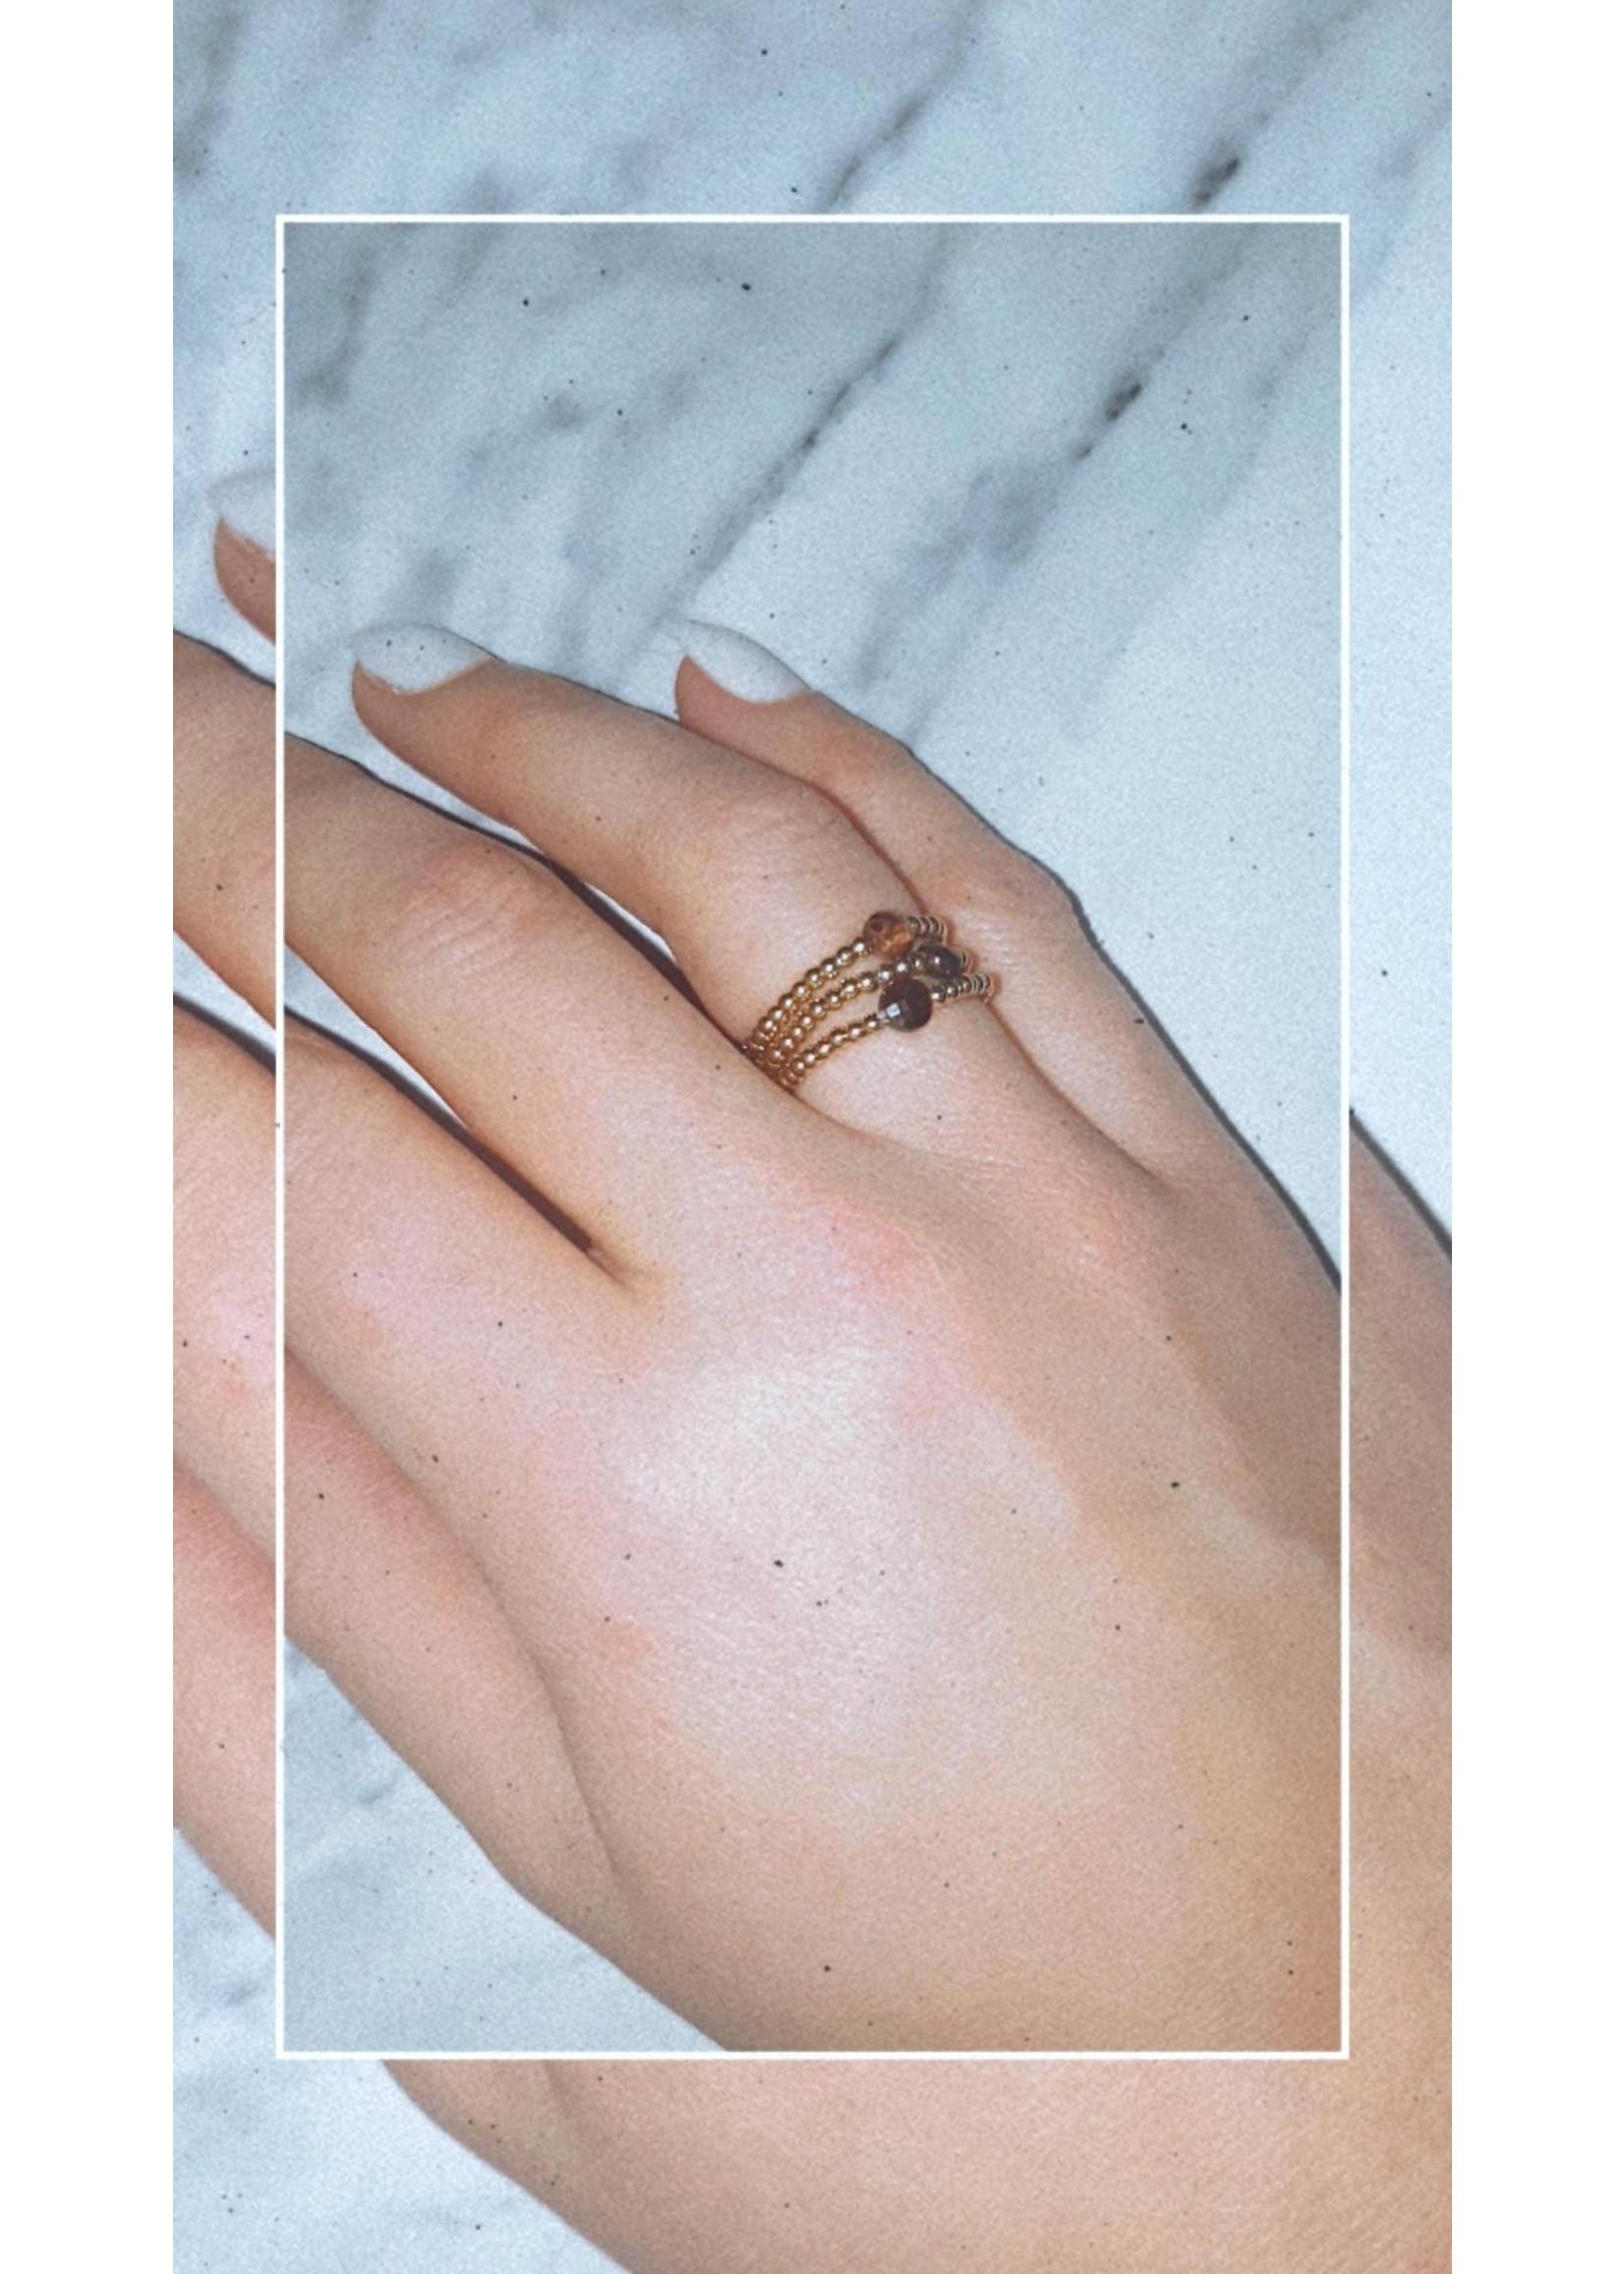 My Jewellery Ringetje van elastiek gekleurde steen GOUD - BRUIN